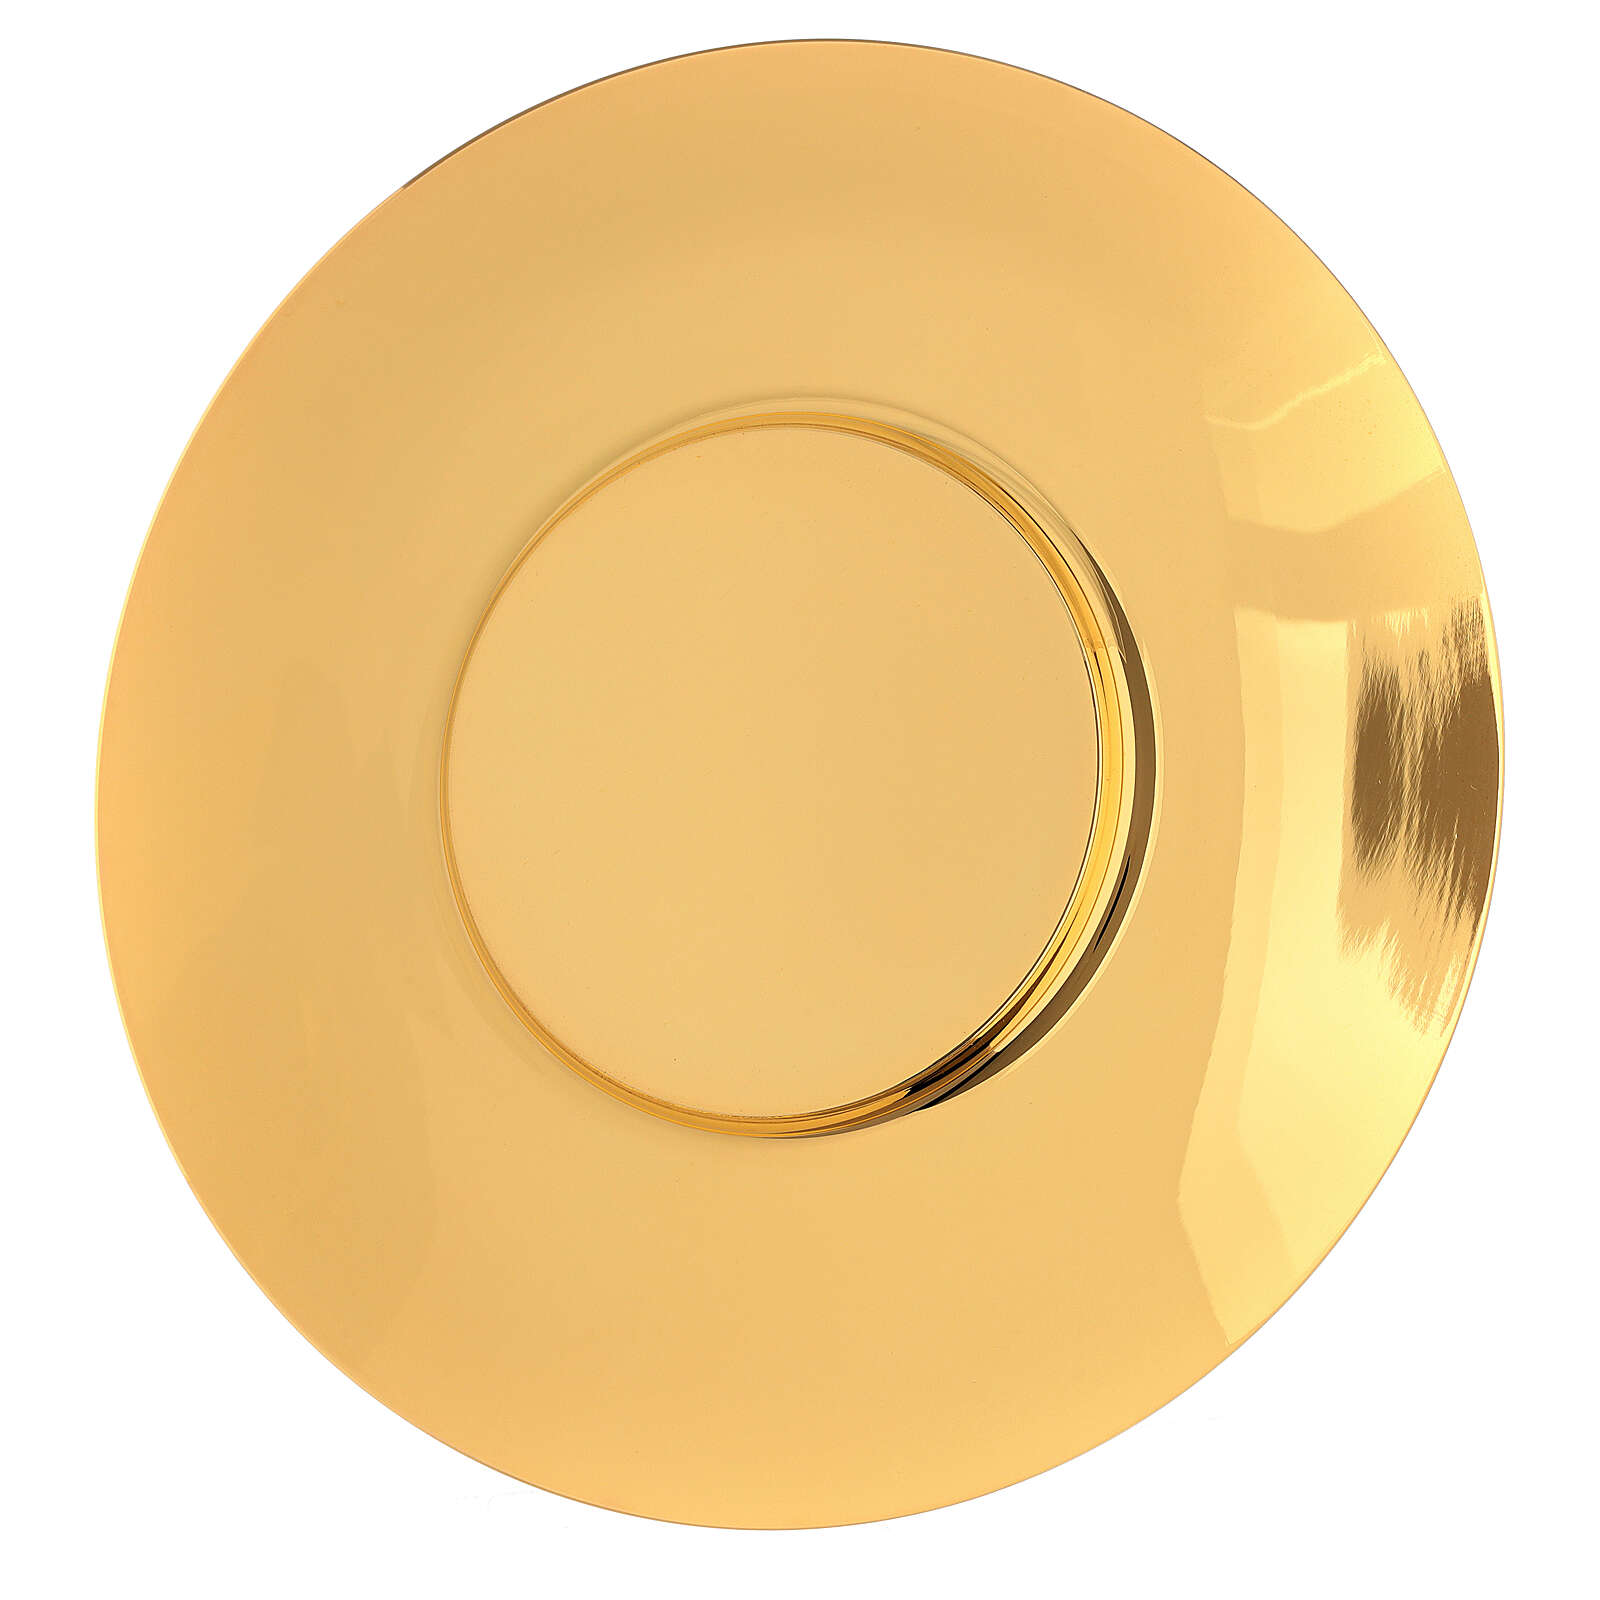 Paten in brass diam. 20 cm, classic style 4